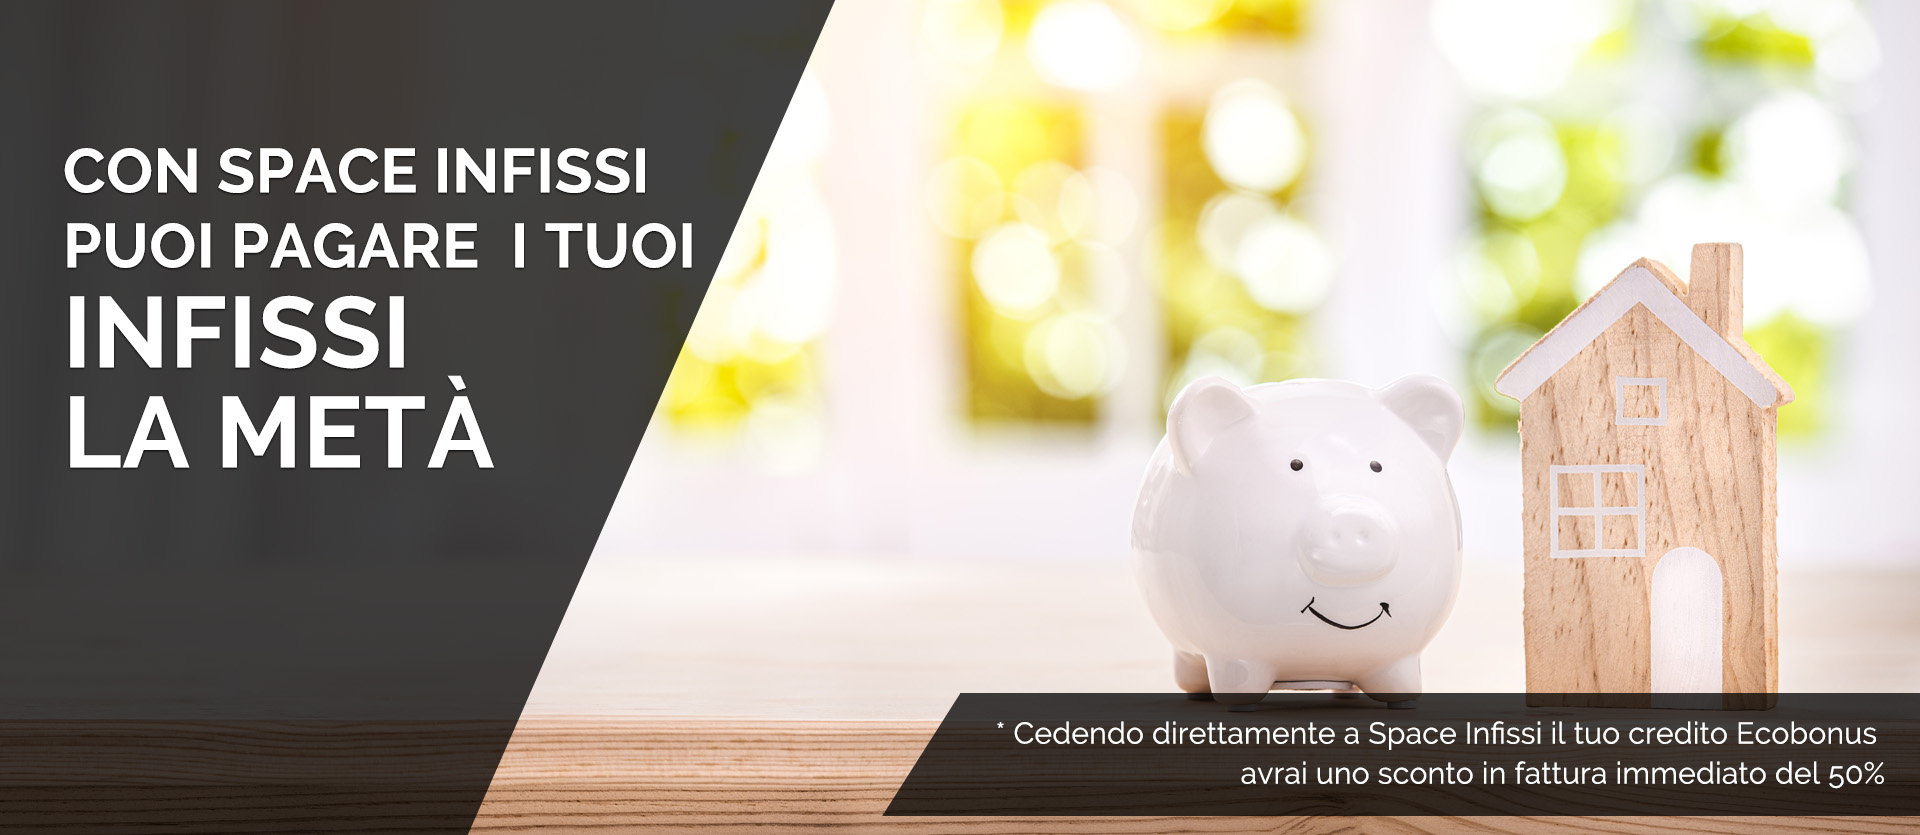 space-infissi-cessione-credito-ecobonus-new